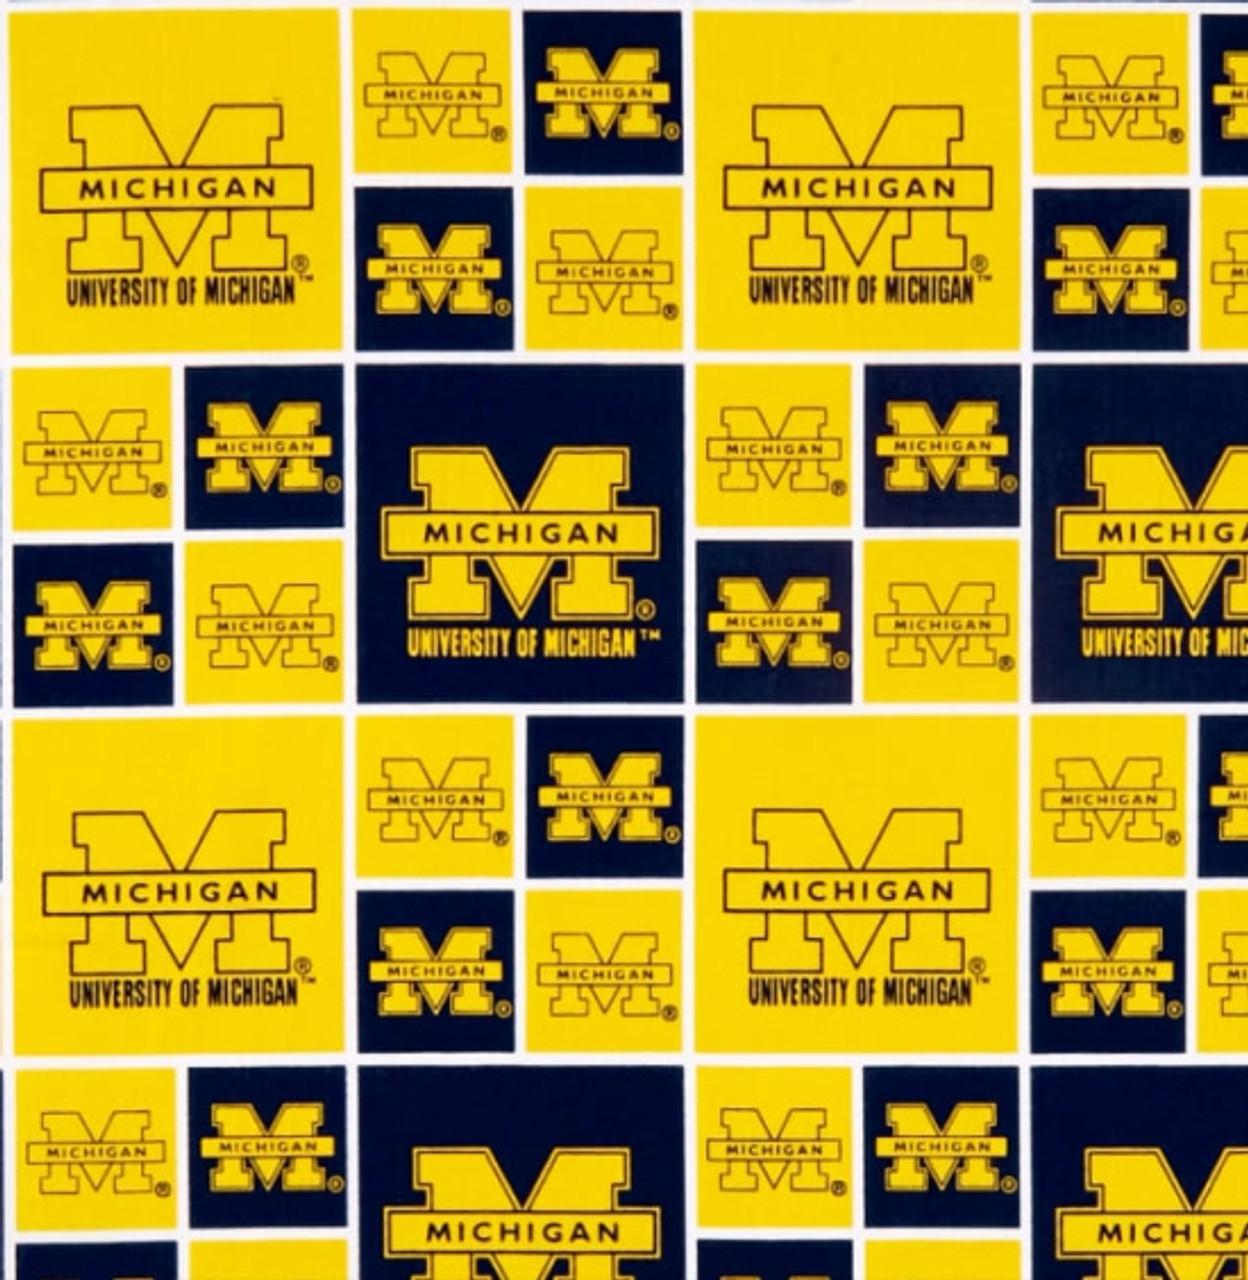 University of Michigan Wolverines Greek Letter Apparel